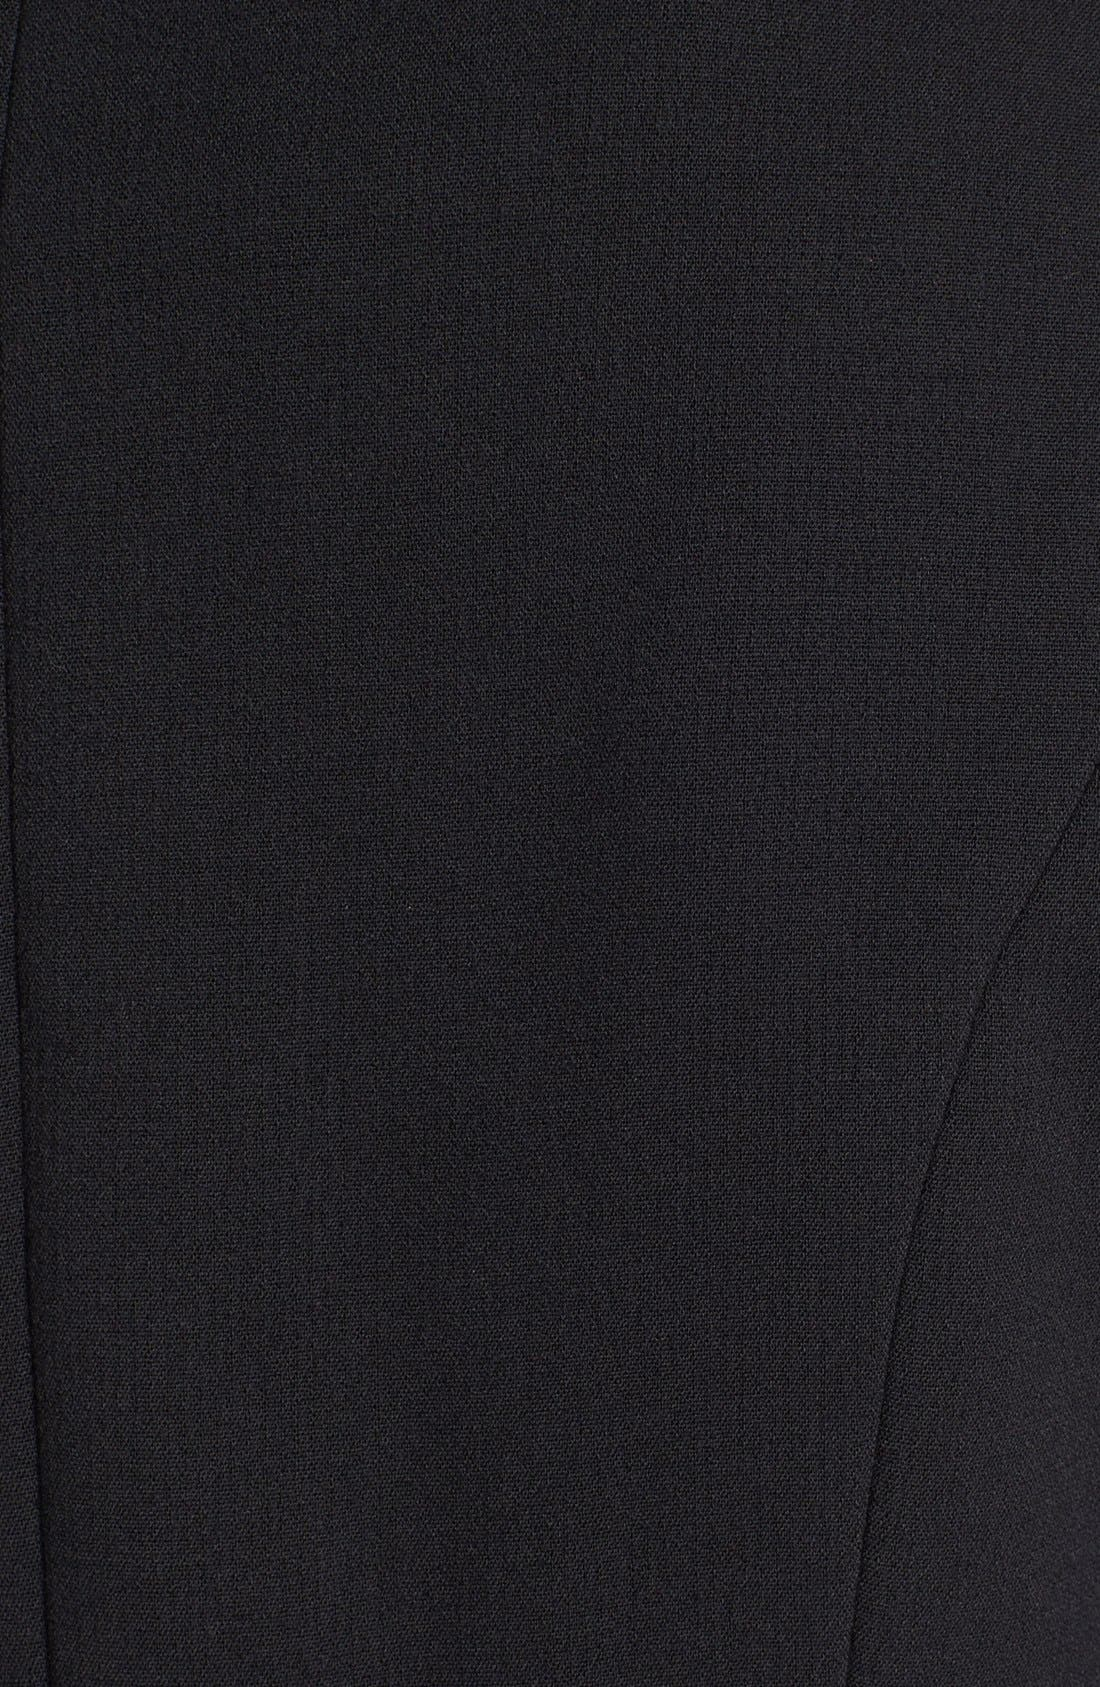 Alternate Image 3  - bebe Asymmetrical Coat with Detachable Faux Fur Collar